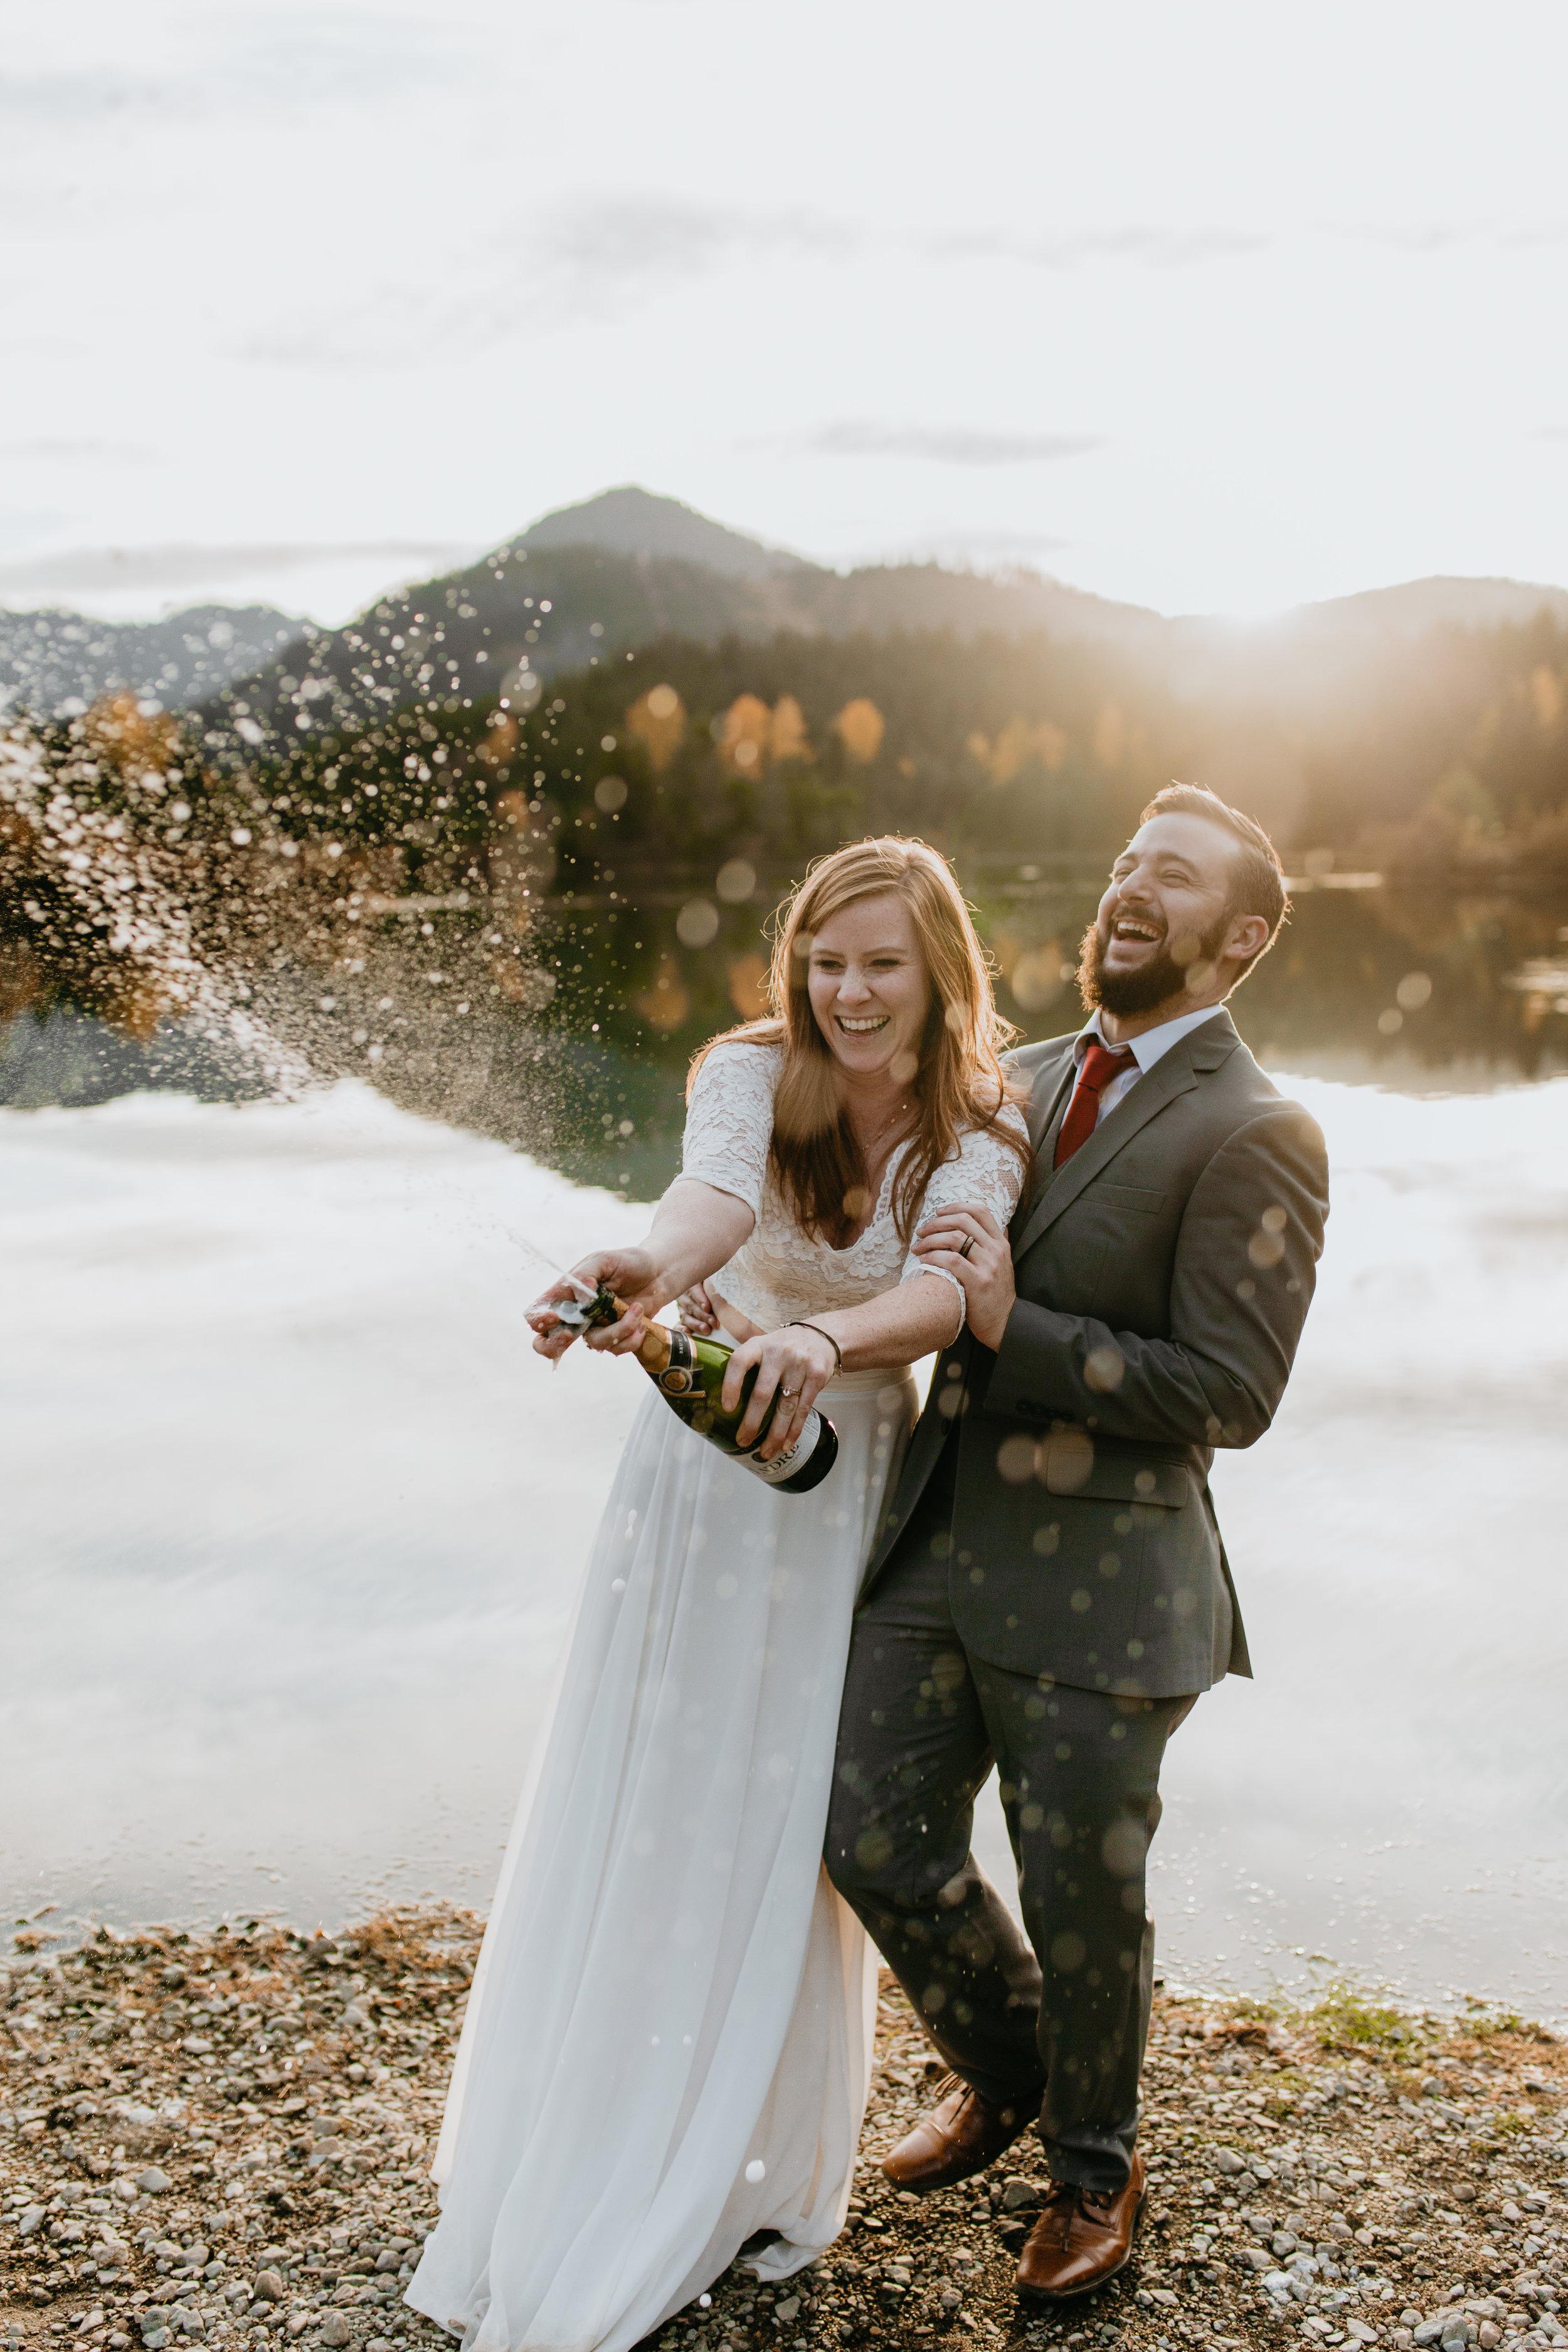 nicole-daacke-photography-mountain-view-elopement-at-gold-creek-pond-snoqualmie-washington-wa-elopement-photographer-photography-adventure-elopement-in-washington-fall-lakeside-golden-sunset-boho-fun-bride-0456.jpg